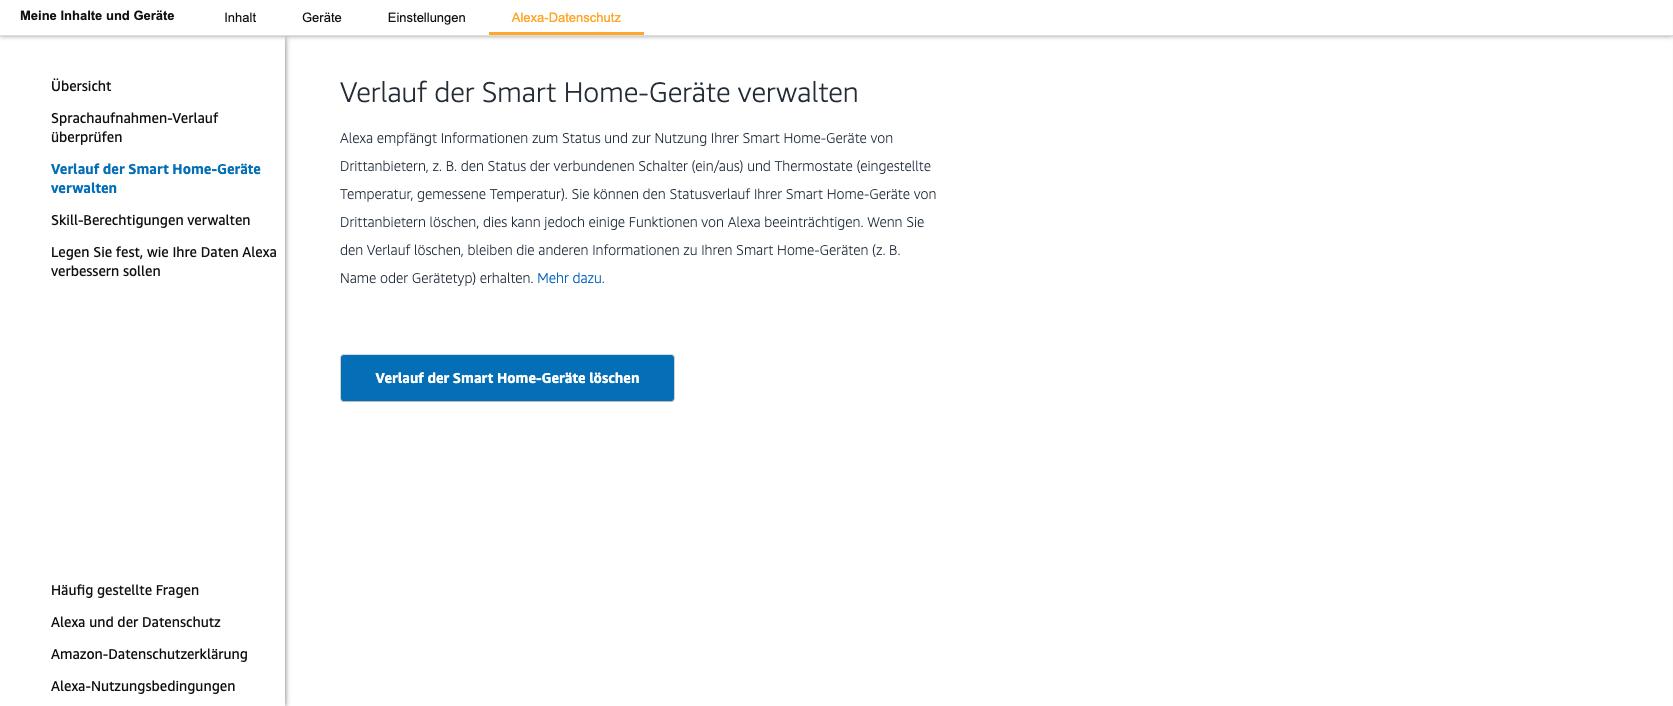 Alexa-Datenschutz-3